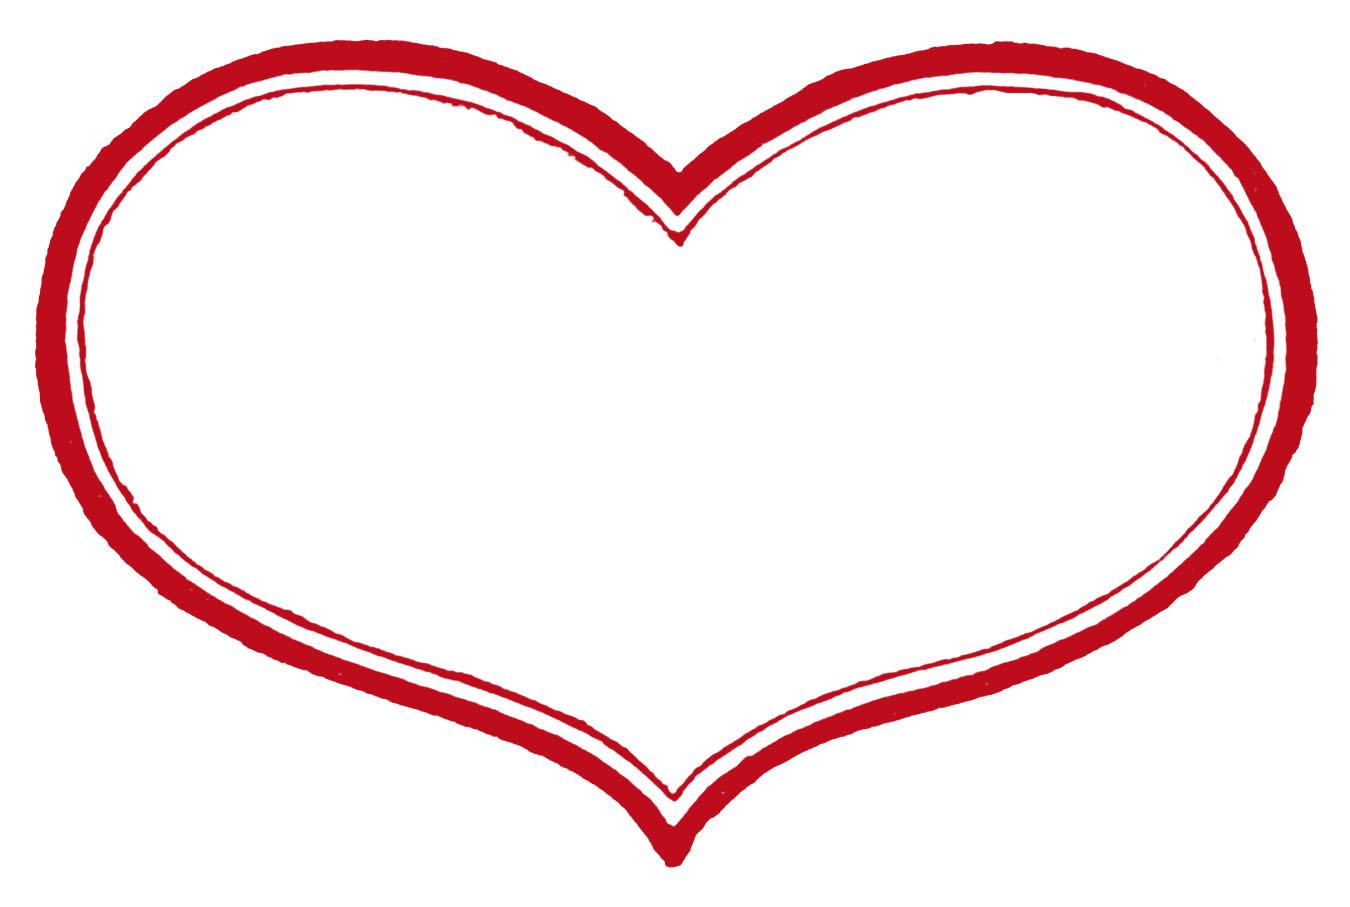 Vintage Valentine Printable - Antique Heart Labels - The Graphics Fairy - Free Printable Valentine Graphics